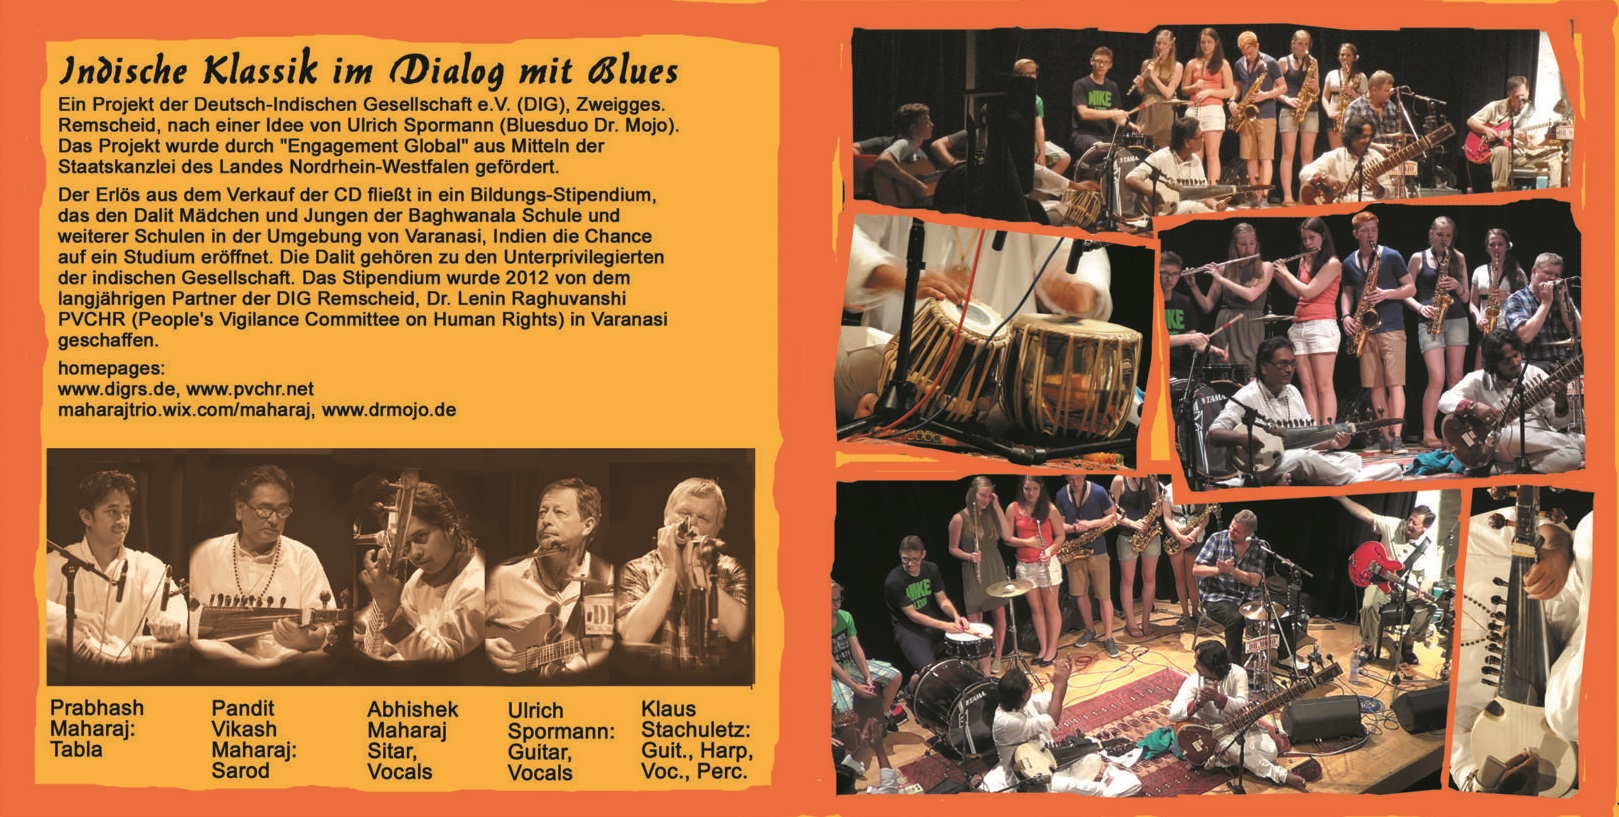 Indische Klassik im Dialog mit Blues - CD